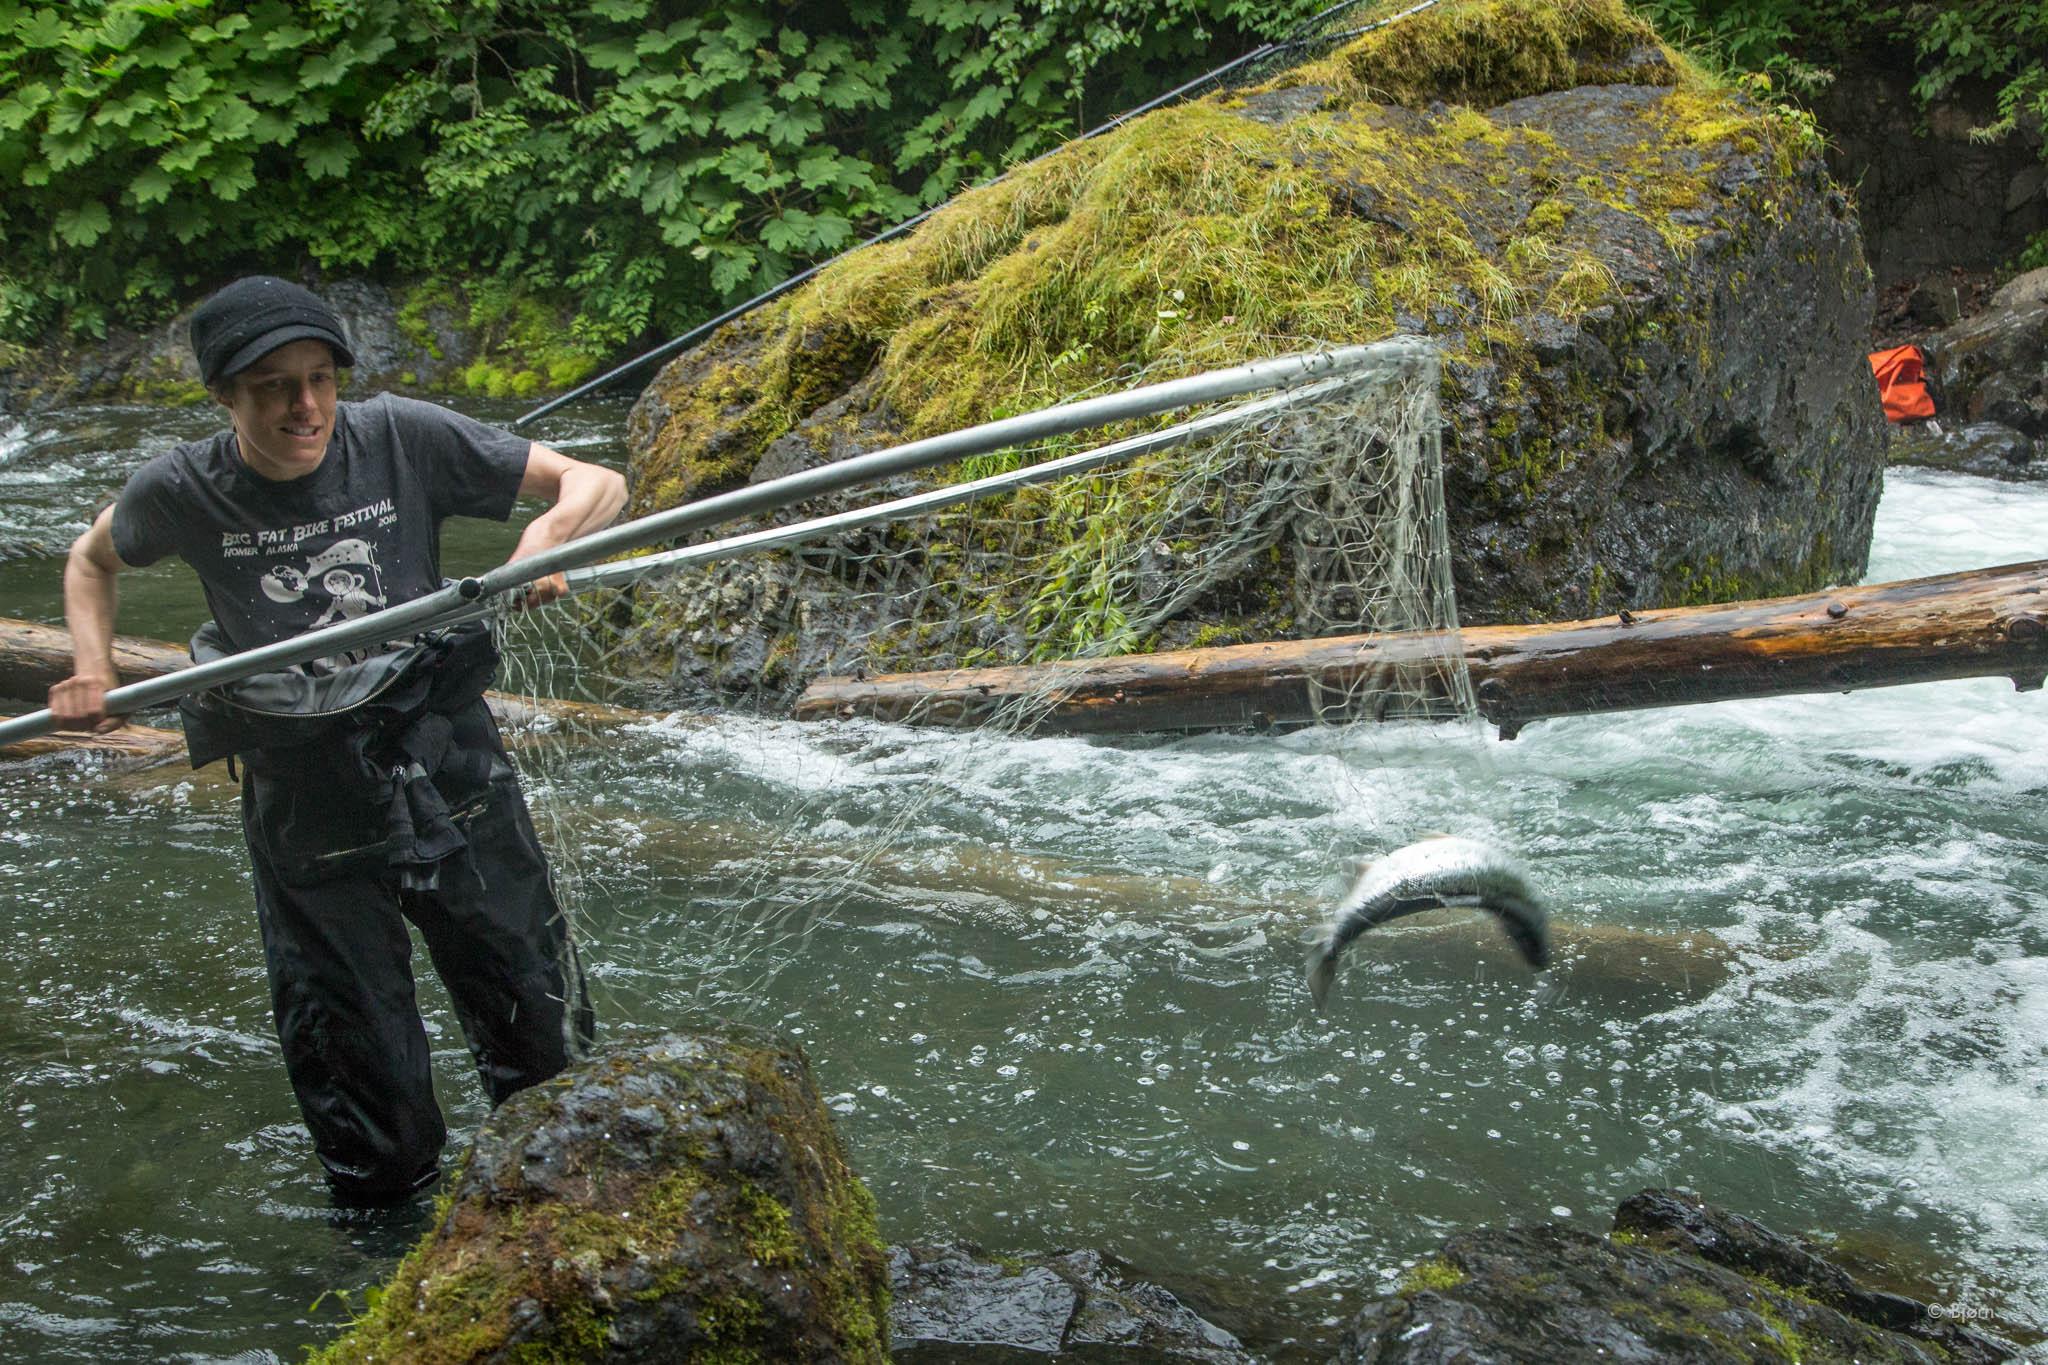 Kim dip-netting sockeye salmon - China Poot, Alaska.